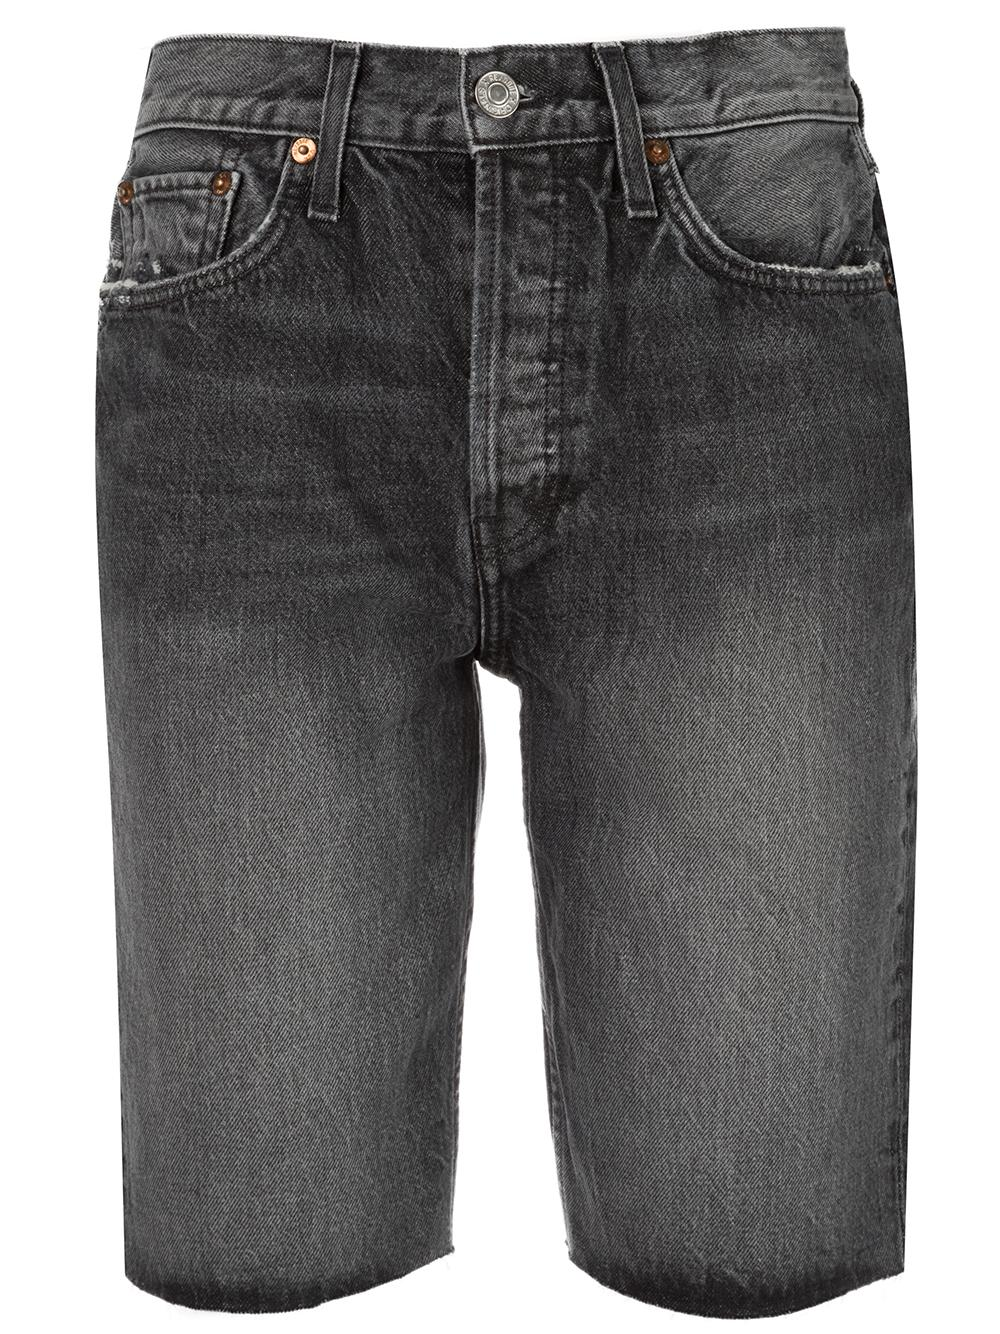 80s Long Short Item # 198-9WLS